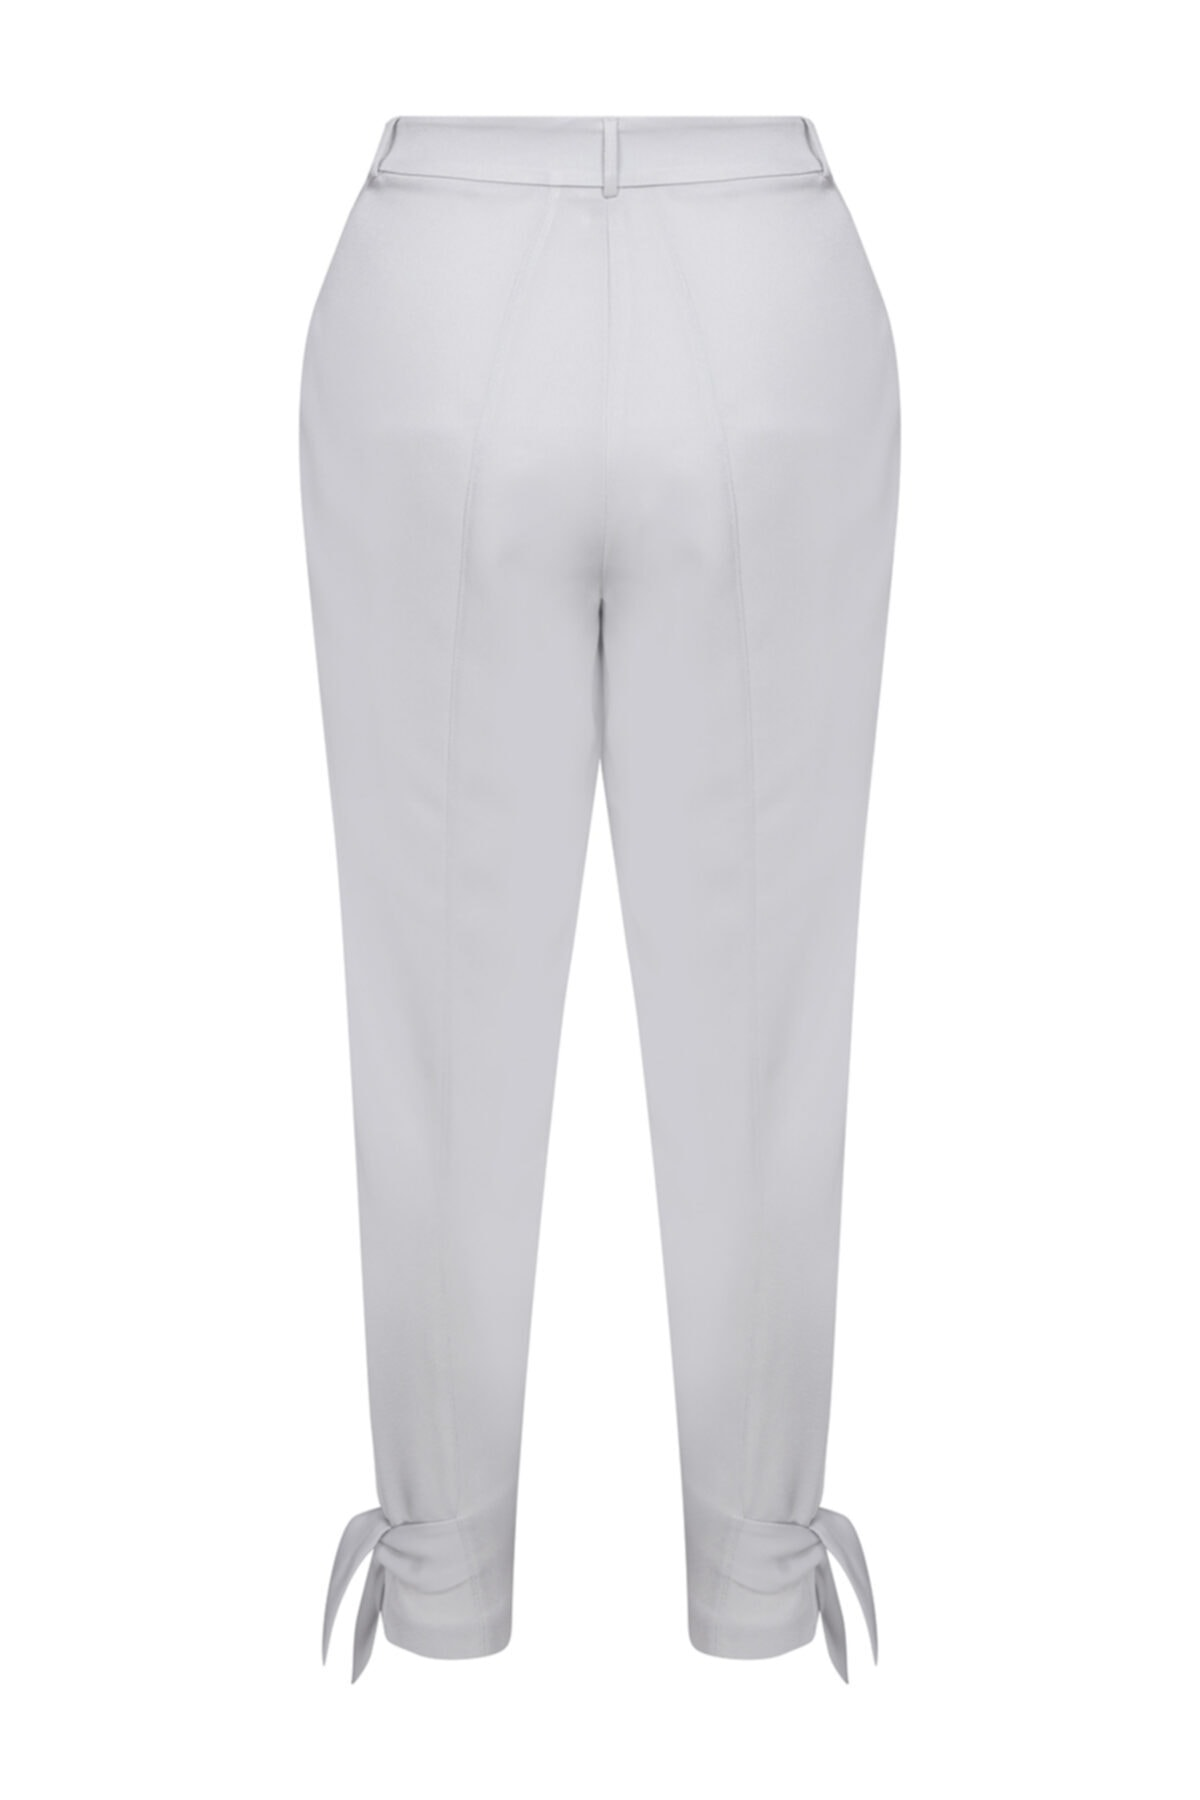 W Collection Paçası Bağlama Detaylı Pantolon 2